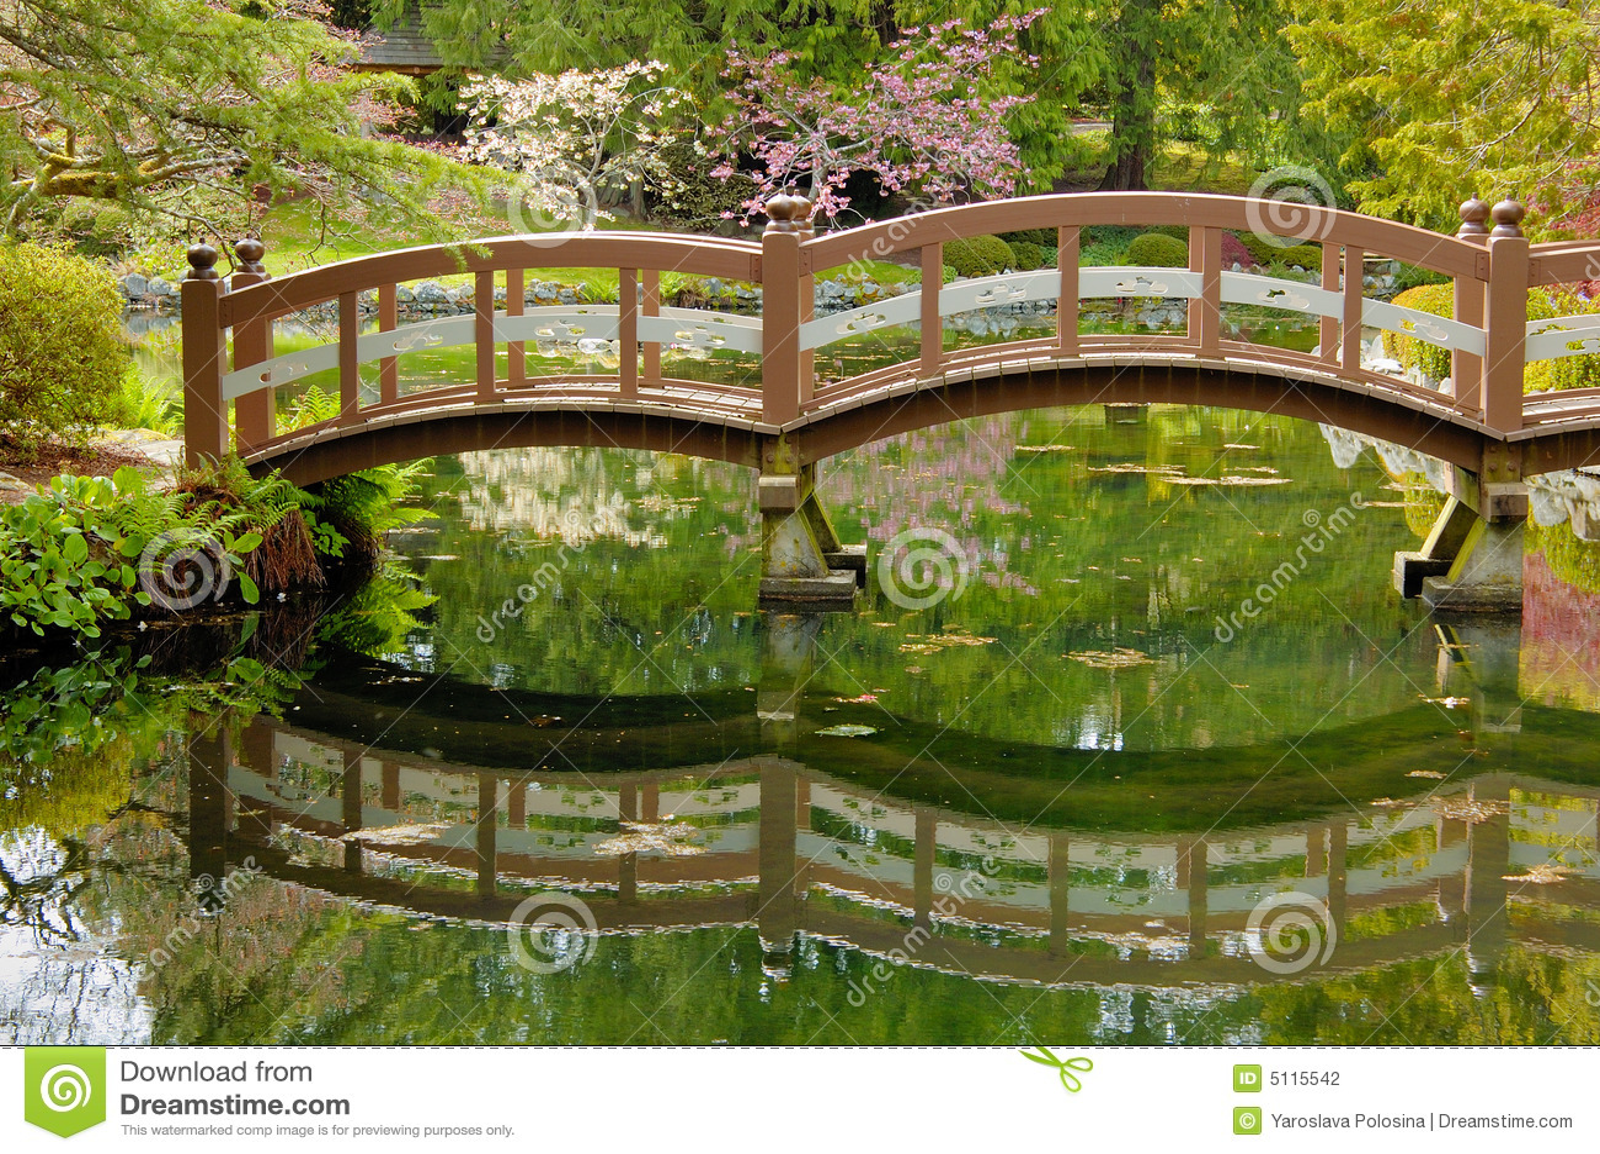 Wooden bridge in japanese garden stock photo image 5115542 for Japanese garden pond bridge